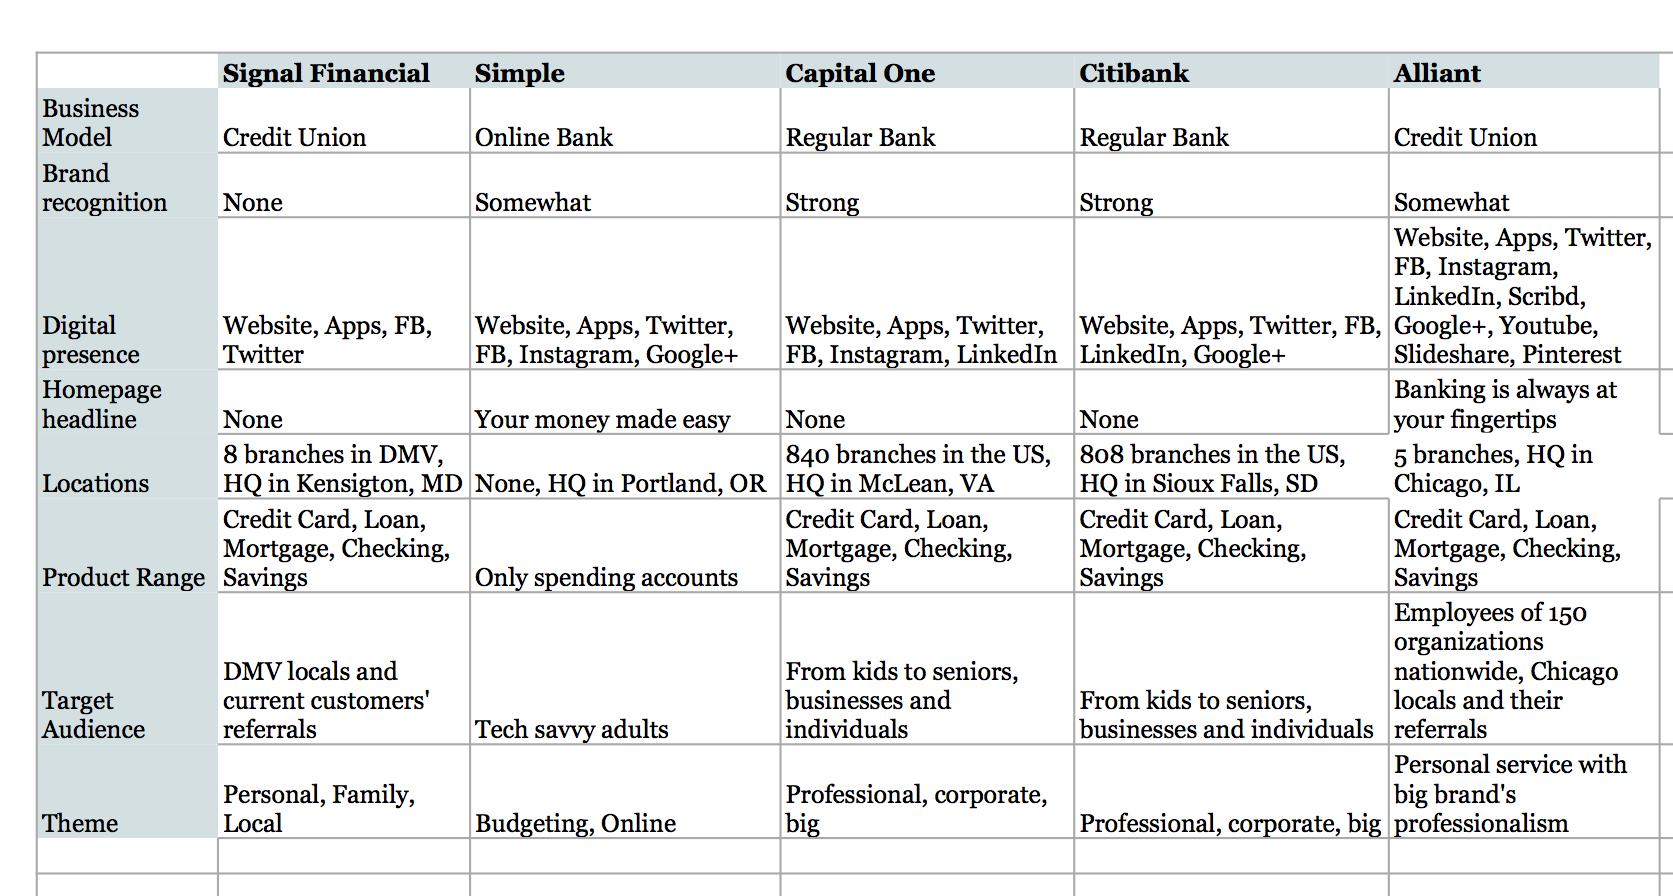 Market positioning chart